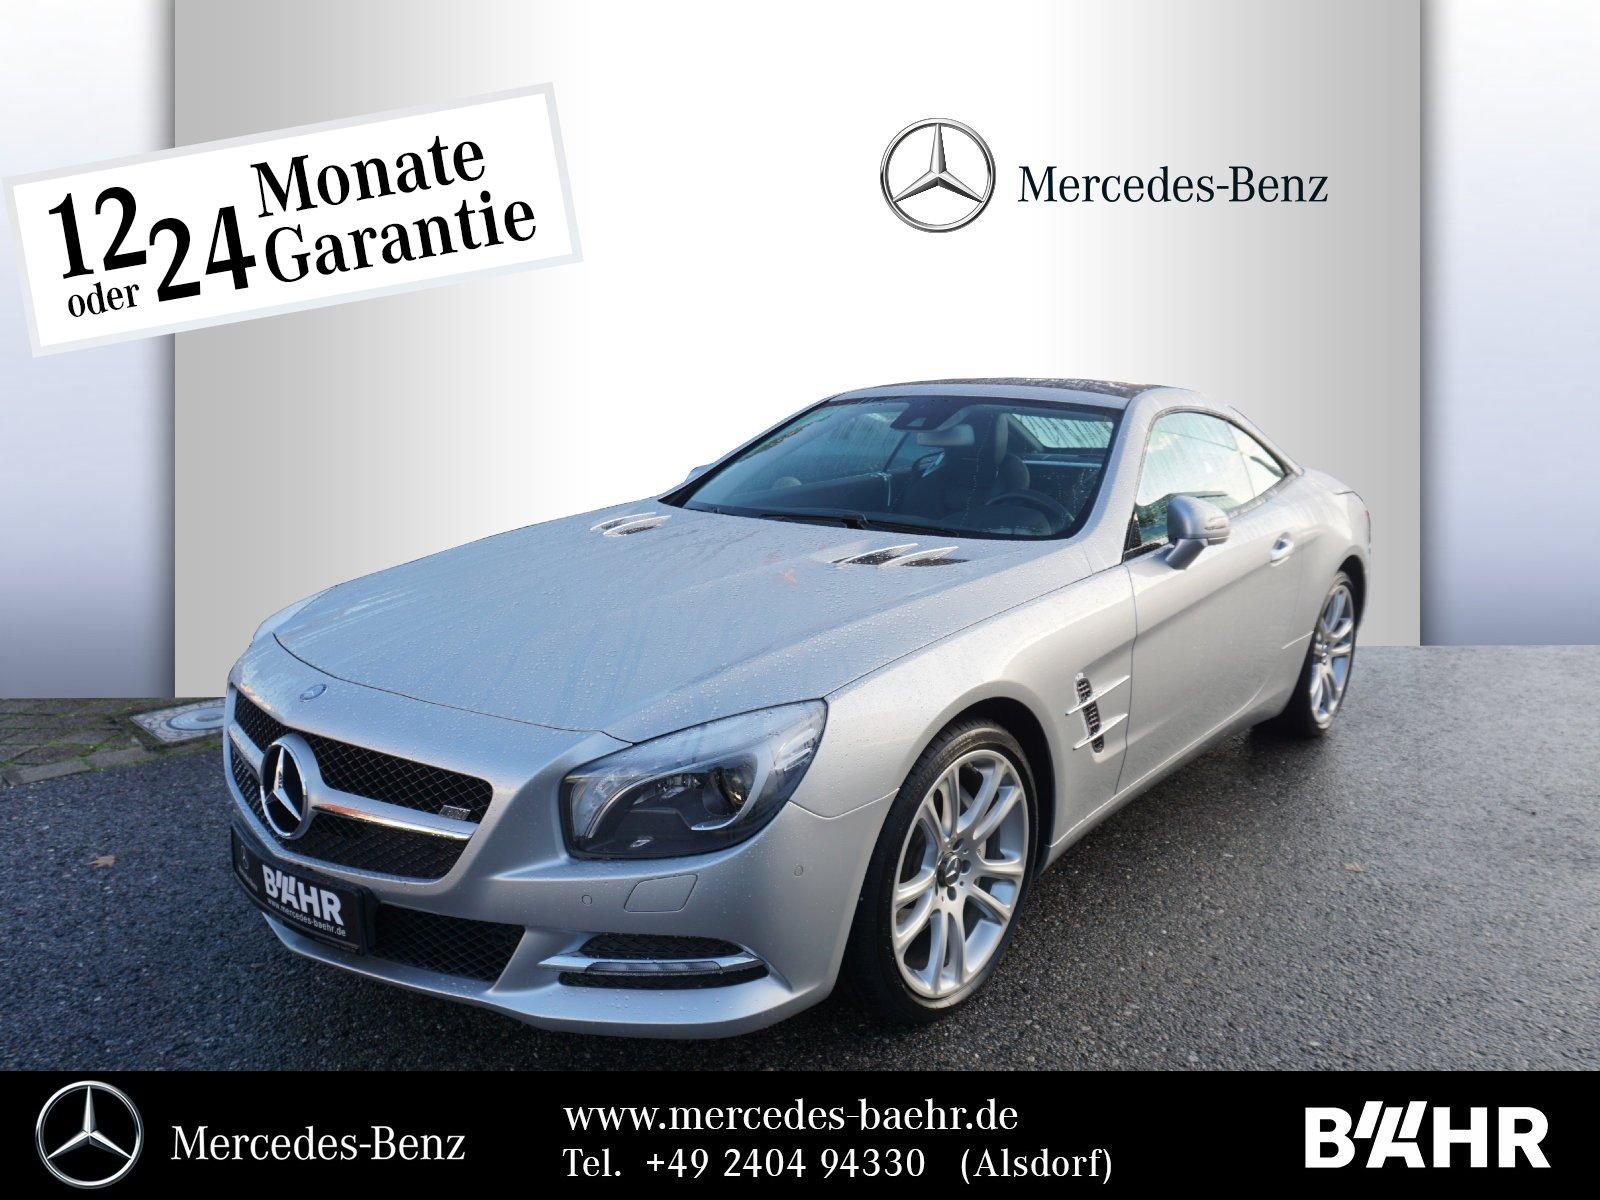 Mercedes-Benz SL 350 Comand/ILS/Harman Kardon/Airscarf/Park, Jahr 2012, petrol